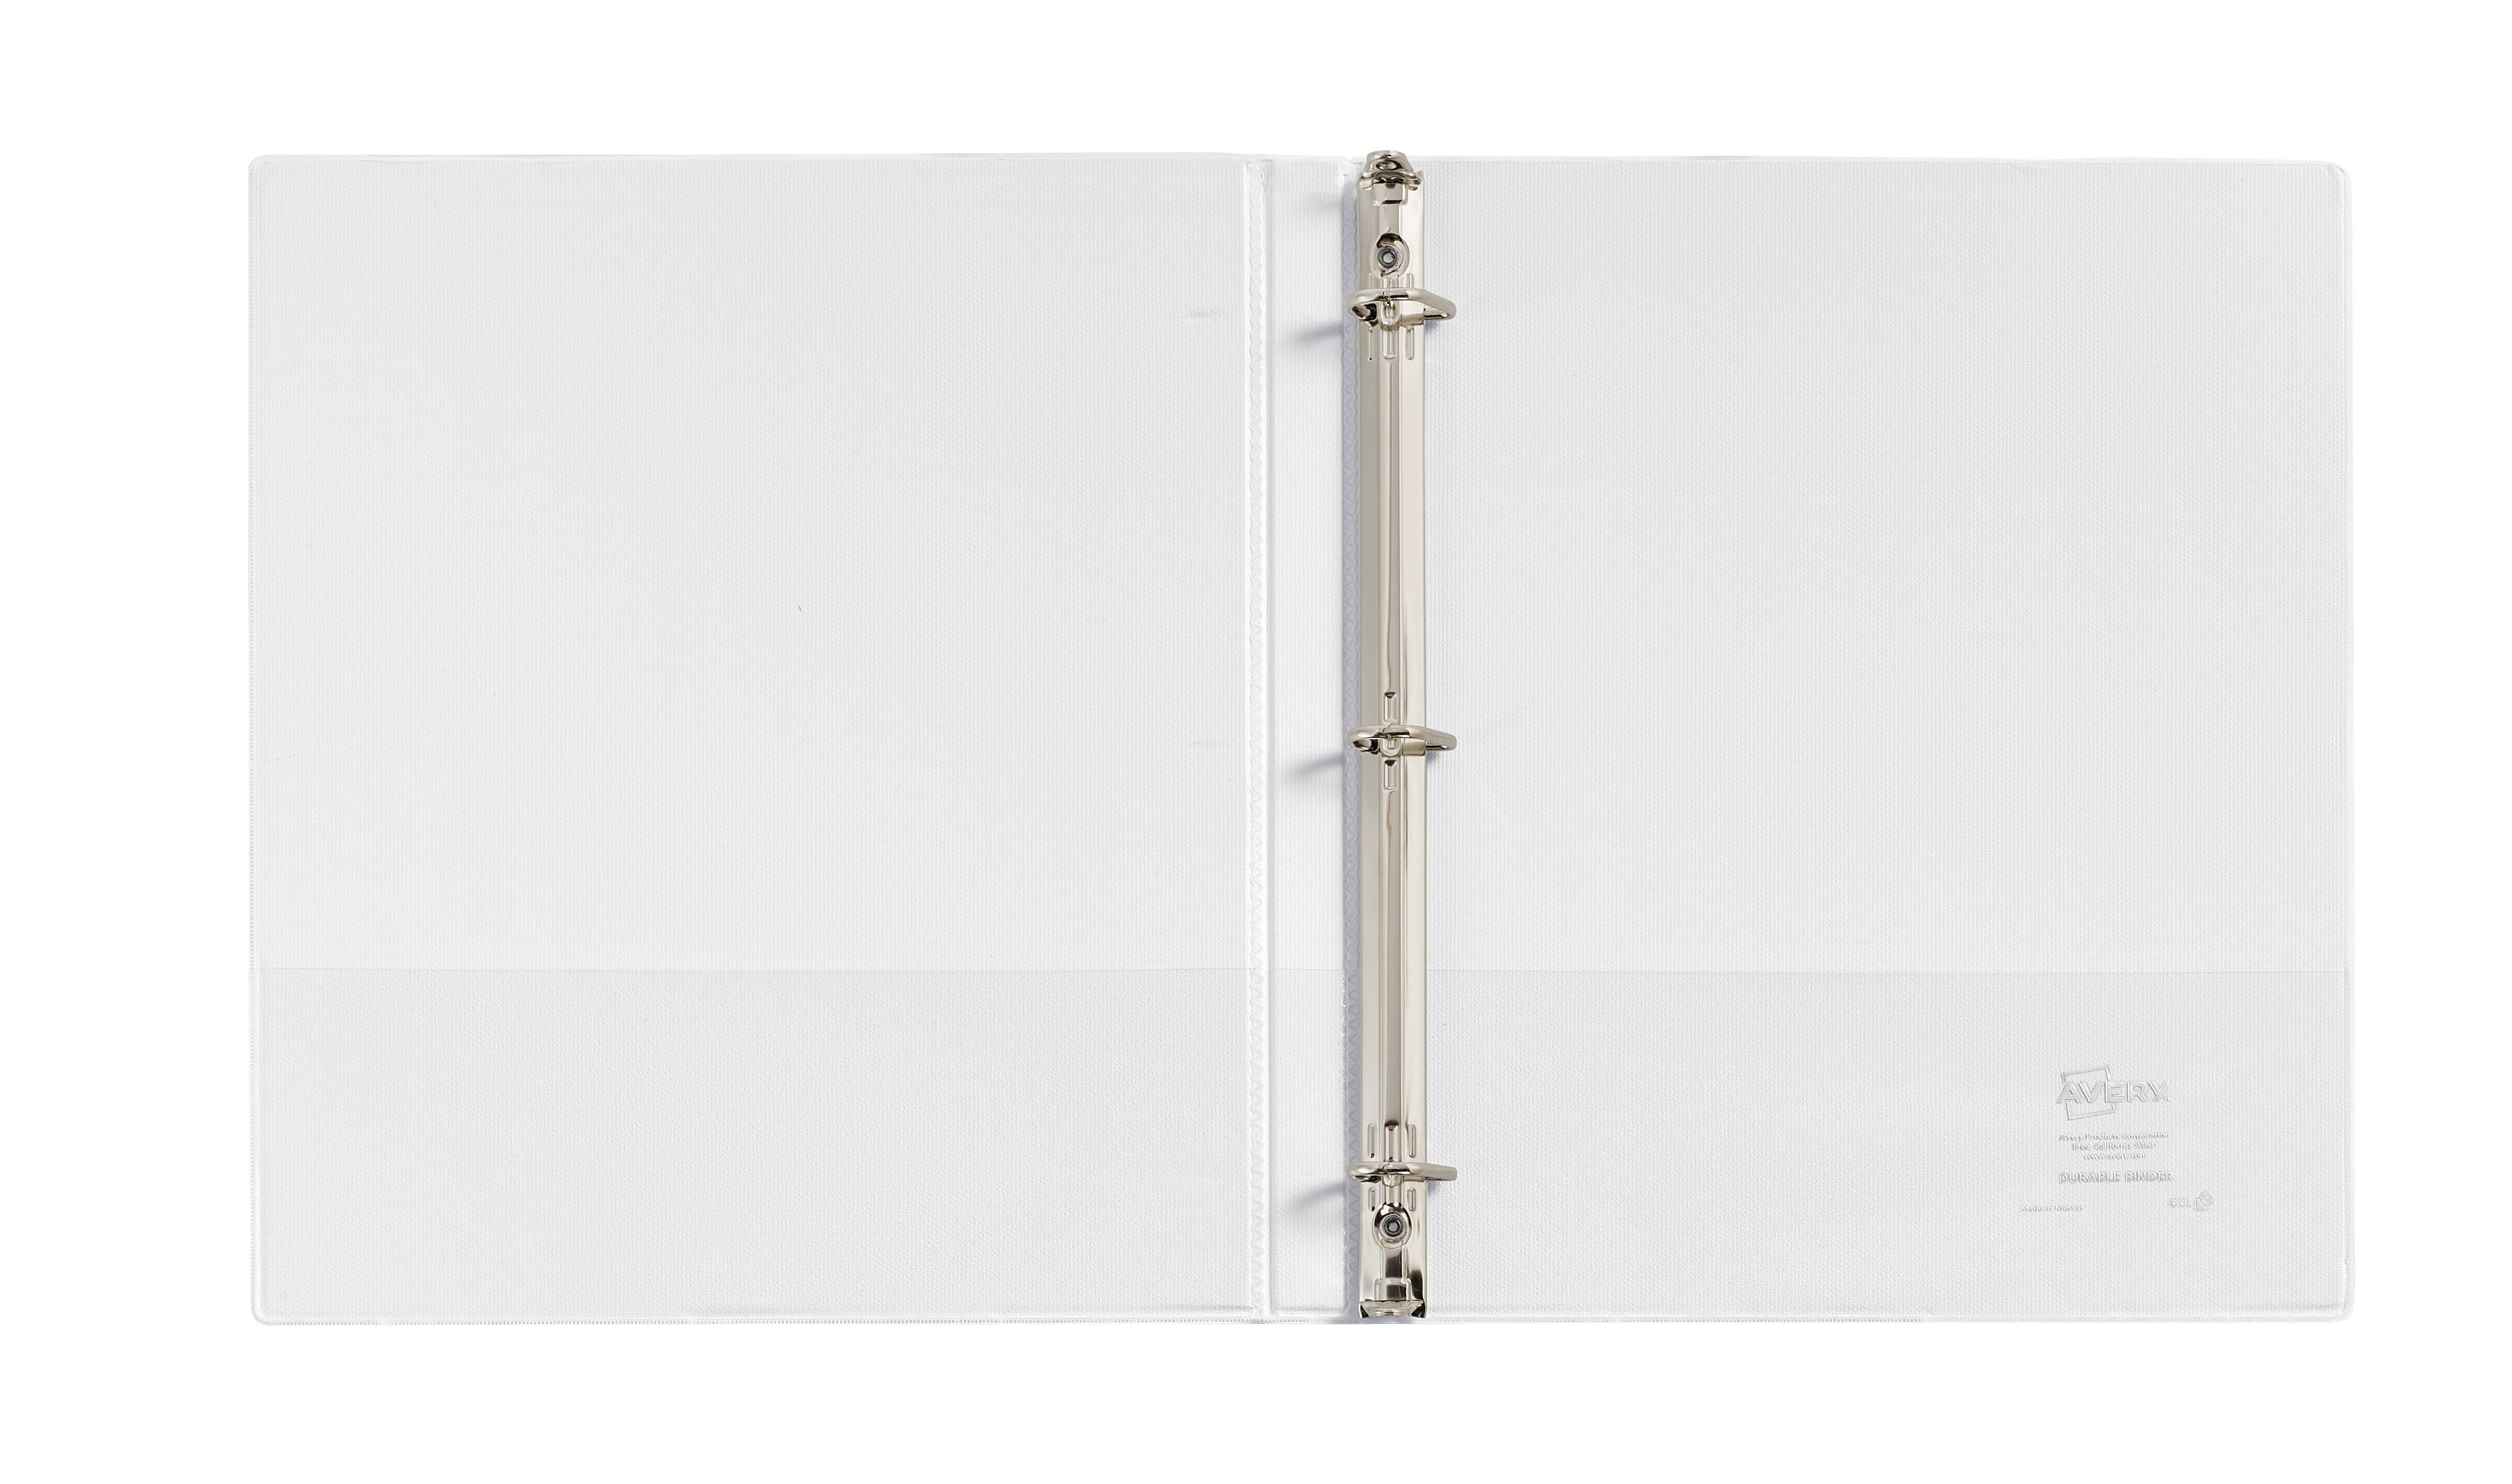 avery 1 2 durable view binder slant rings durahinge white 17002